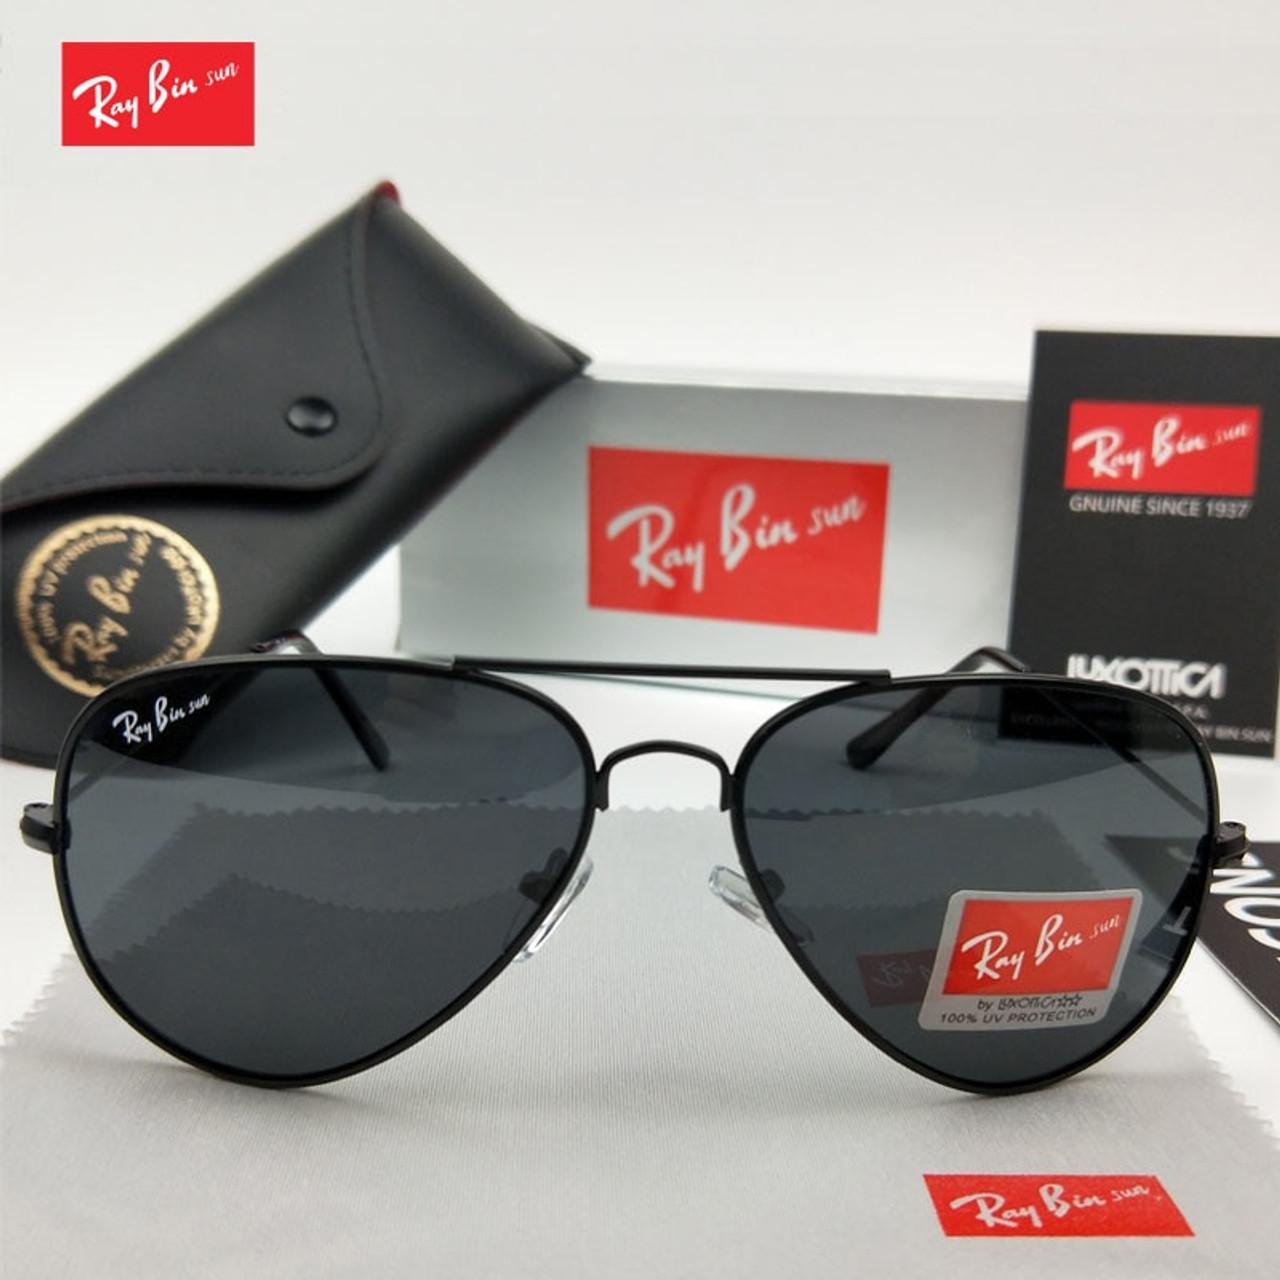 c0550da579b5 Ray Bin Sun Pilot Aviador sunglasses Men Women polarized Brand Designer  Sunglasses Driving Sunglasses oculos vintage ...